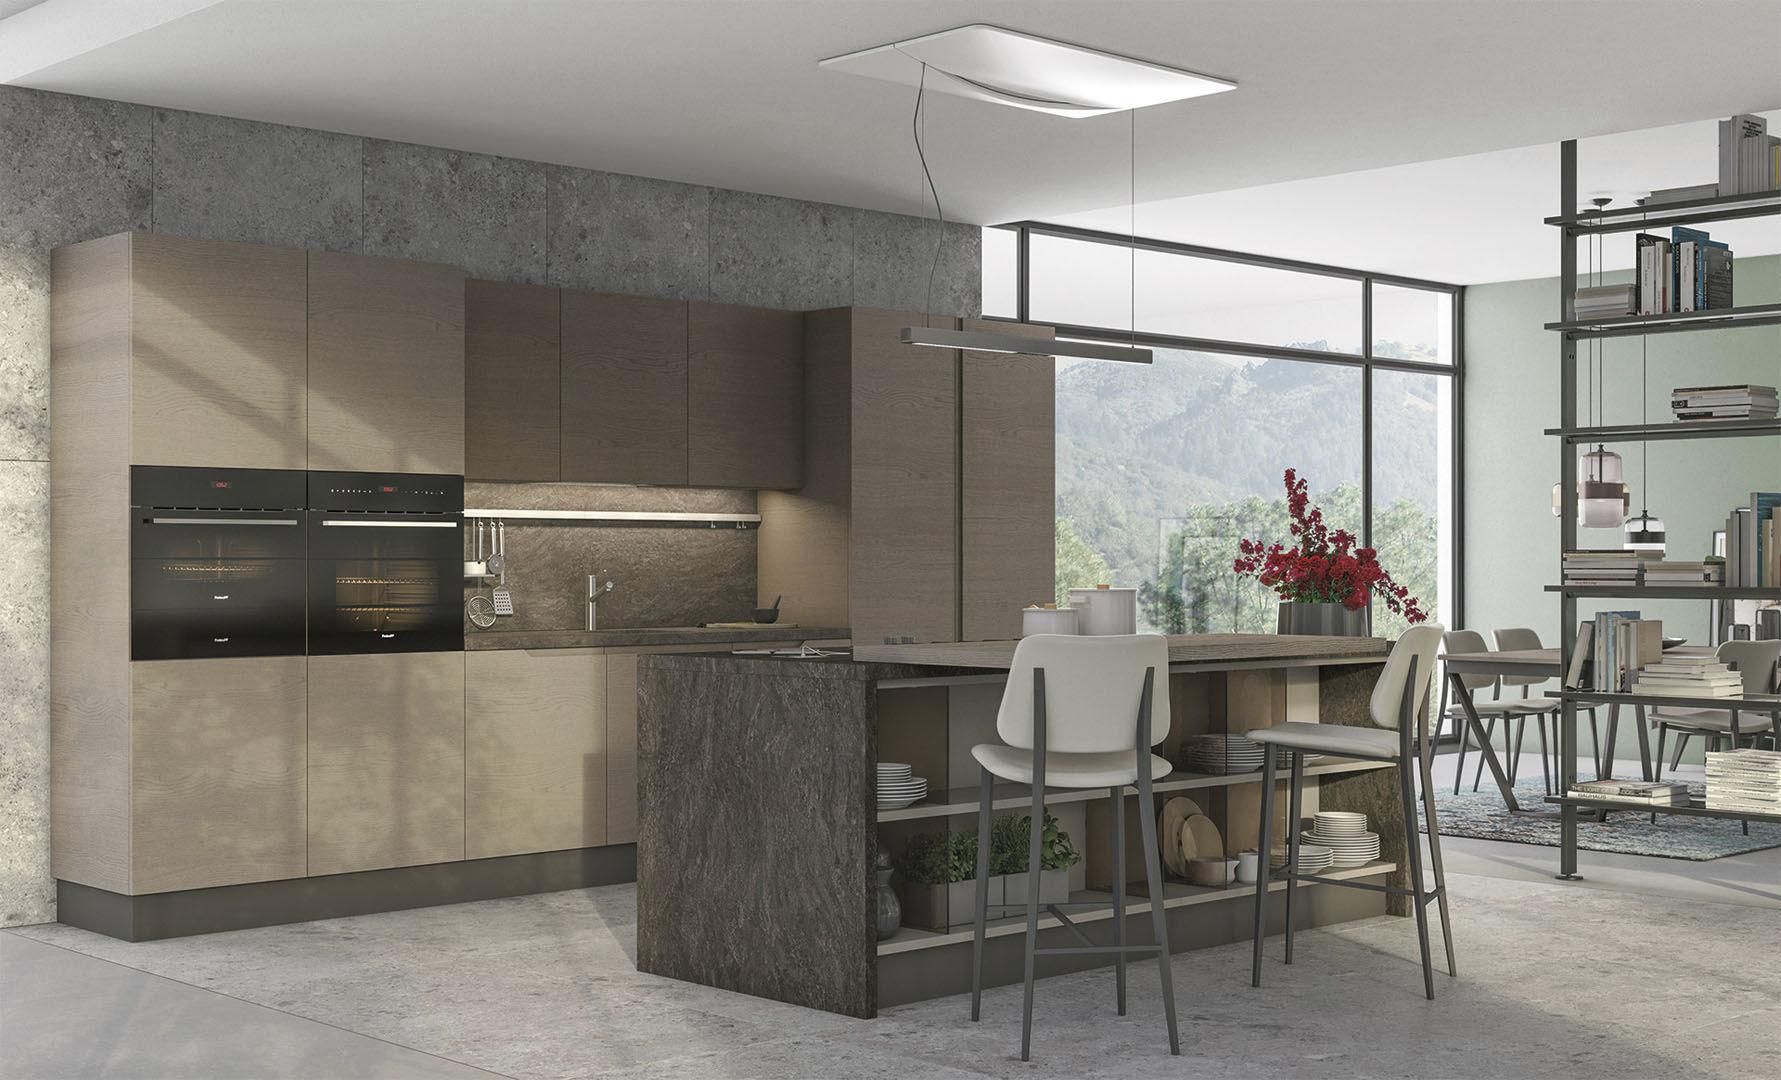 Moderne Küche / Holz / Kochinsel / lackiert - LUNA - CUCINE LUBE ...